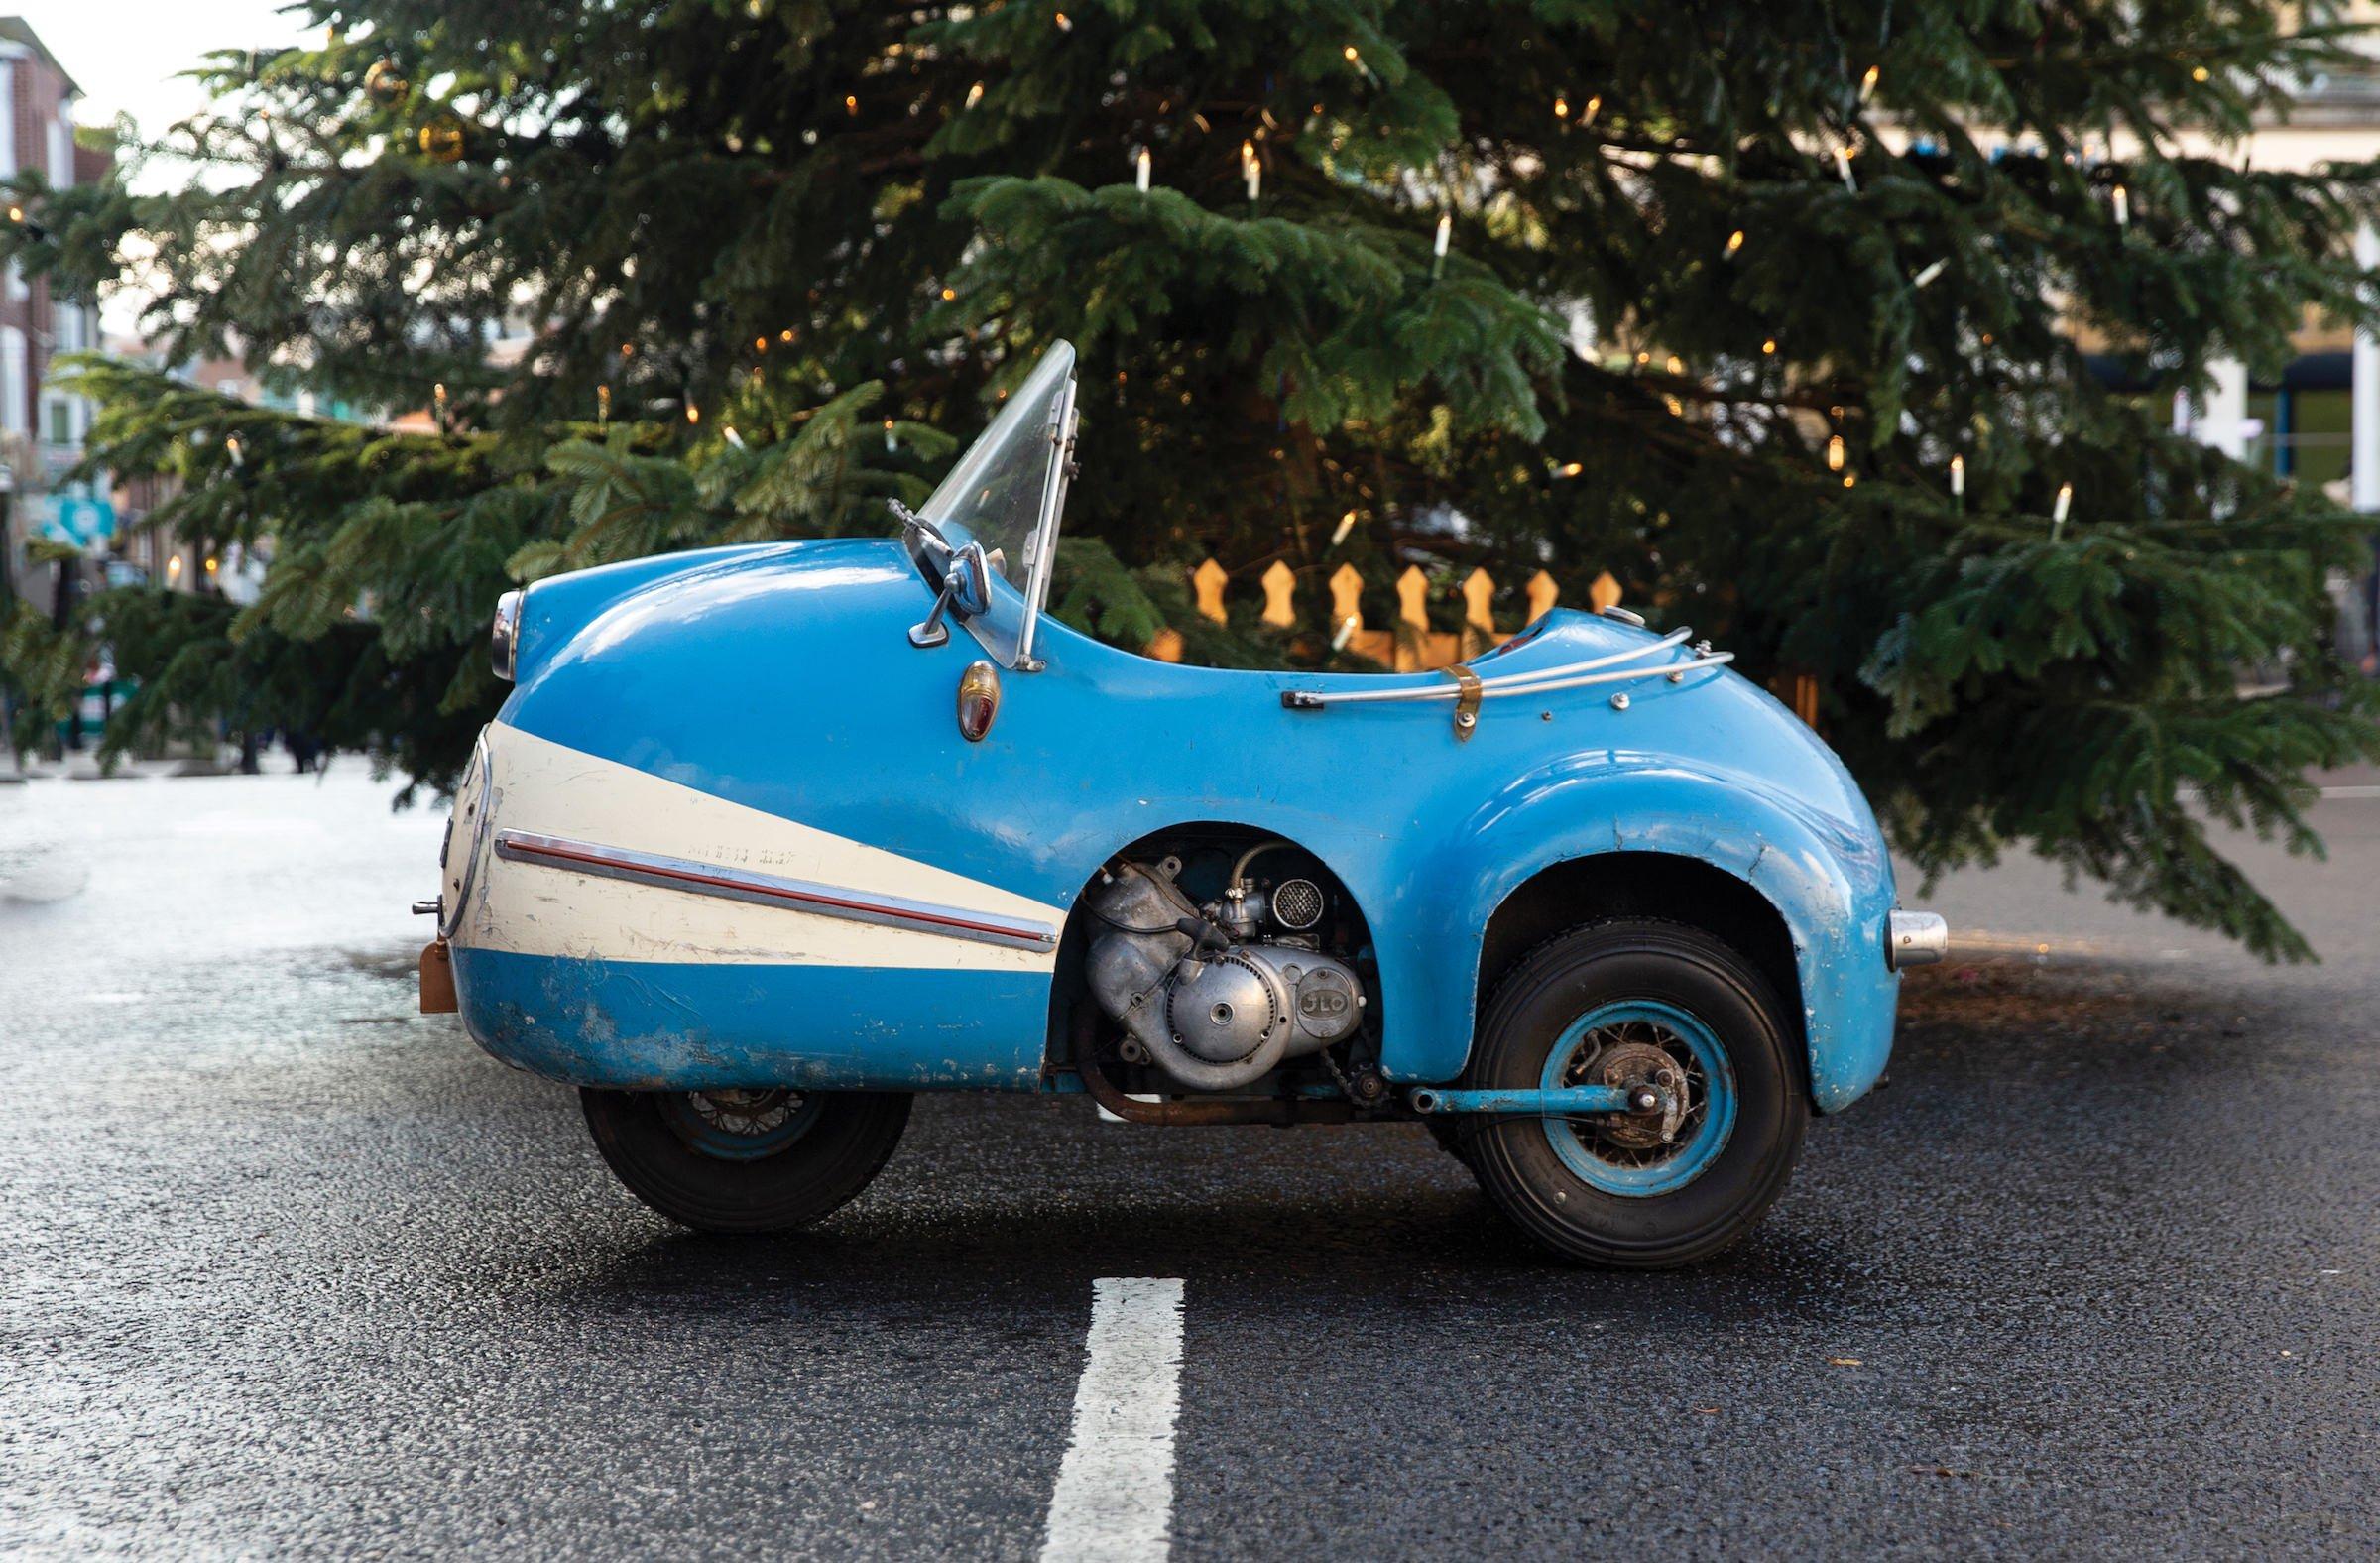 The Brütsch Mopetta - A Rare And Unusual German Microcar